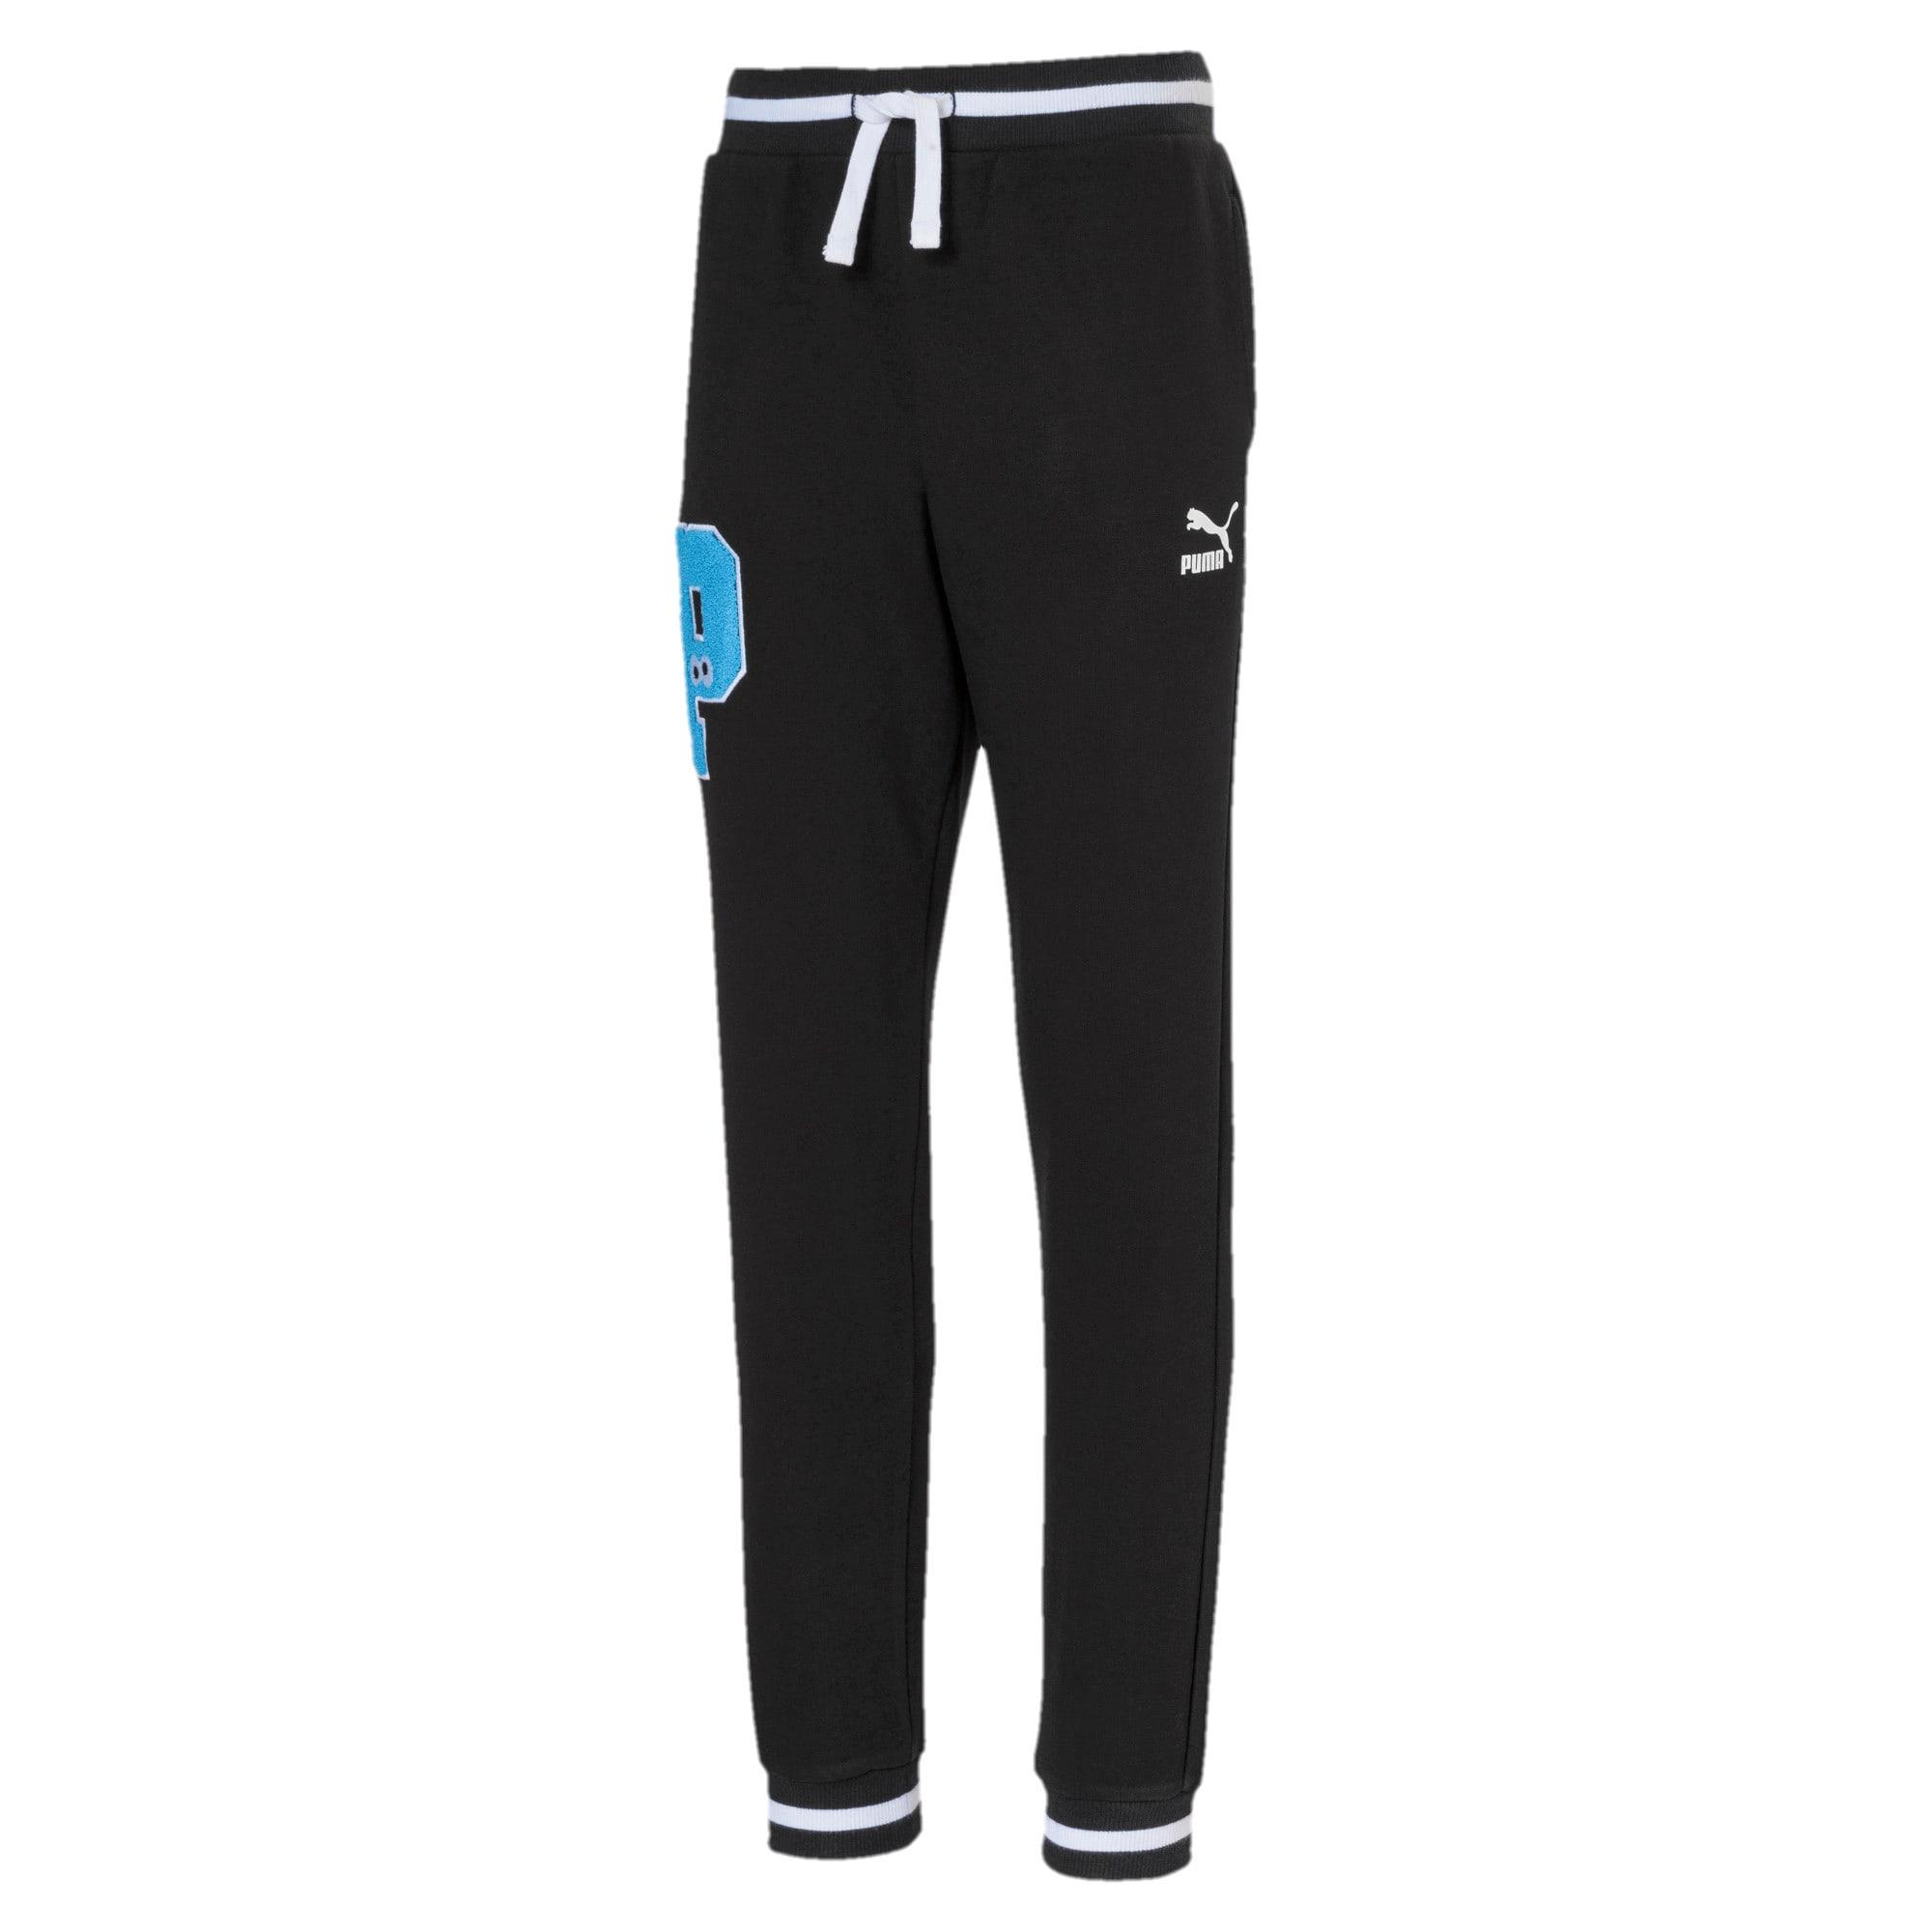 Anteprima 1 di Sesame Street Knitted Boys' Sweat Pants, Puma Black, medio